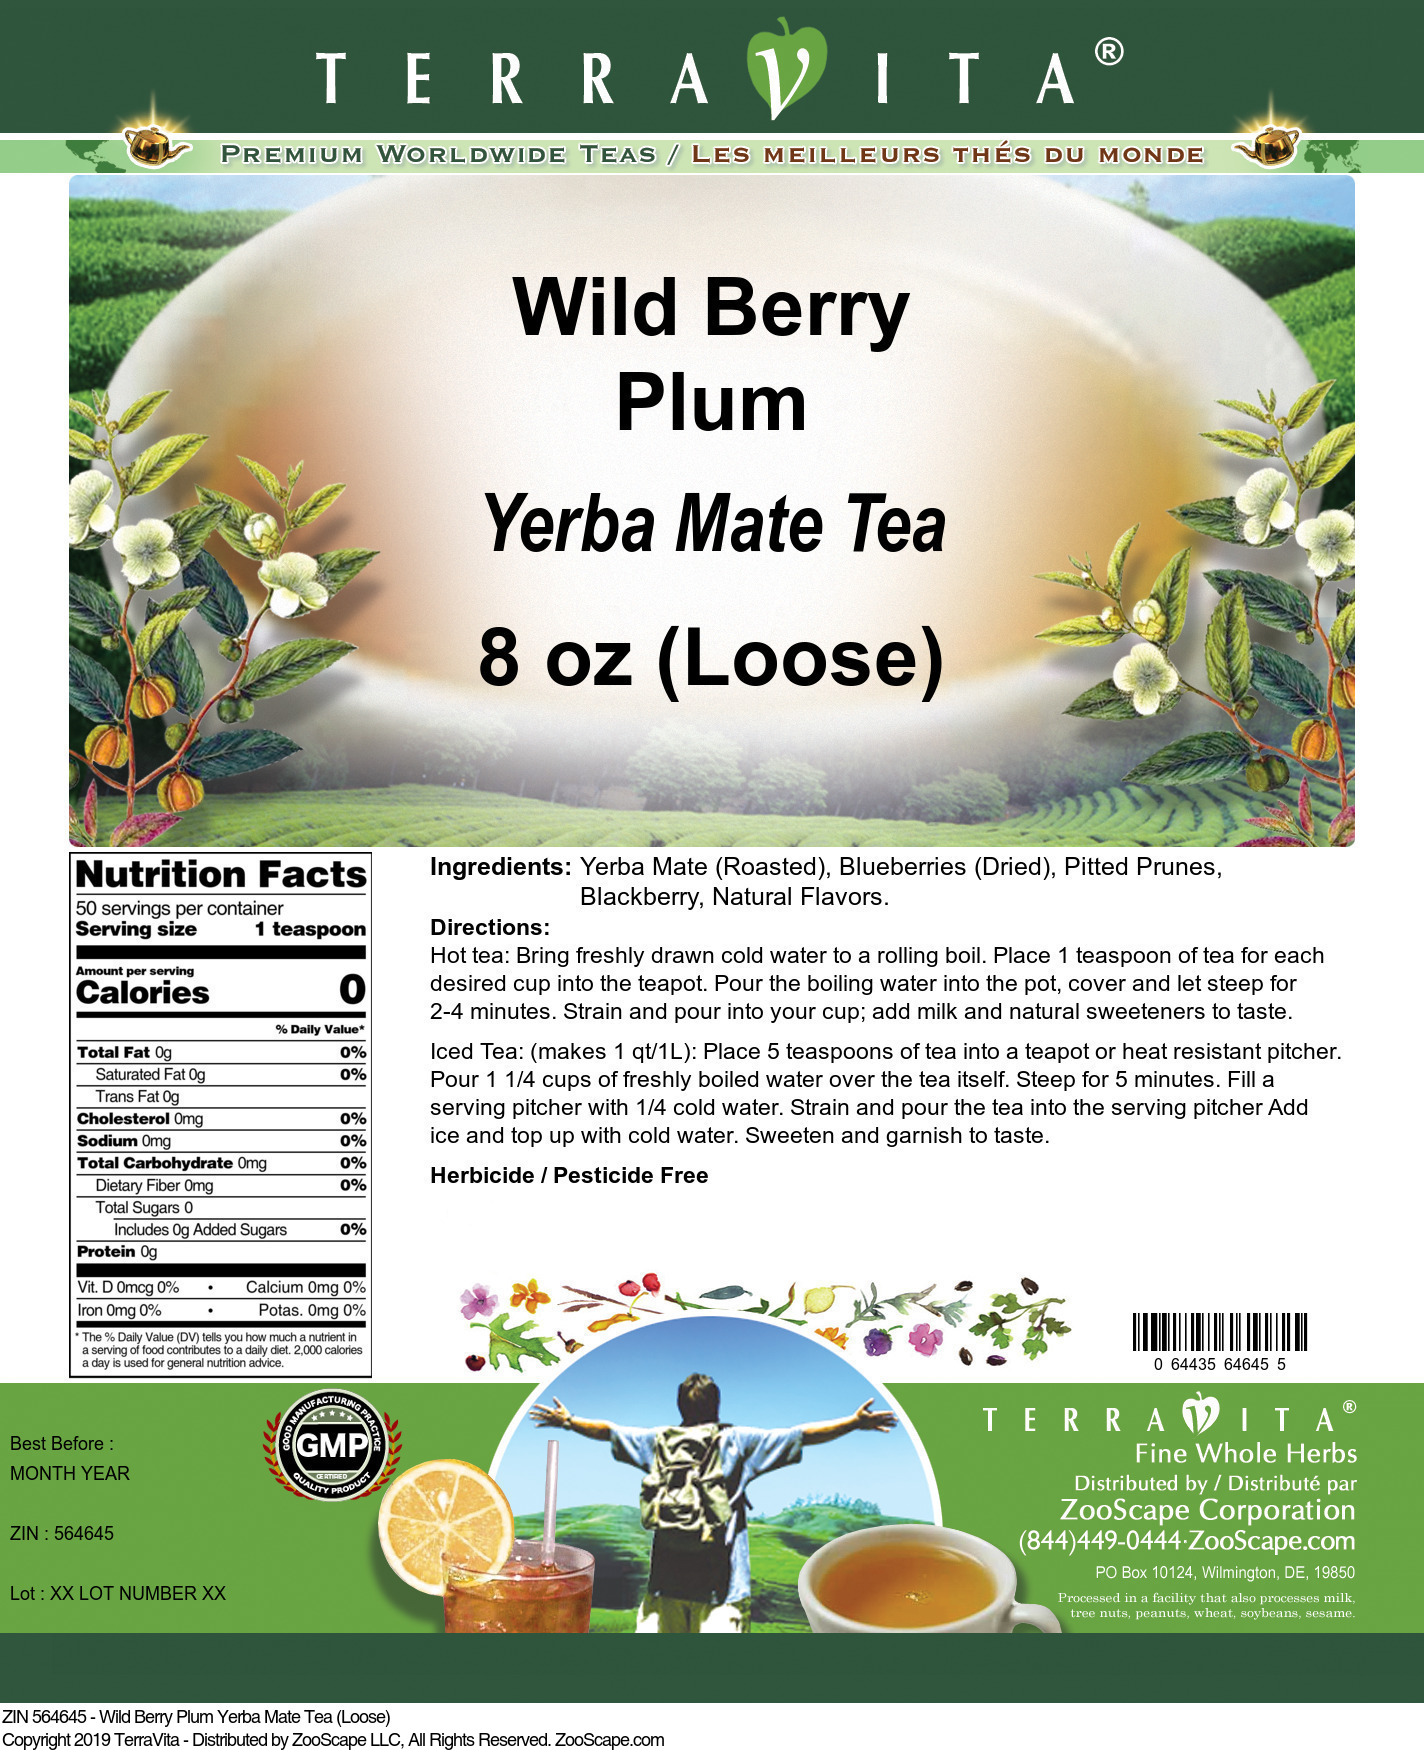 Wild Berry Plum Yerba Mate Tea (Loose)